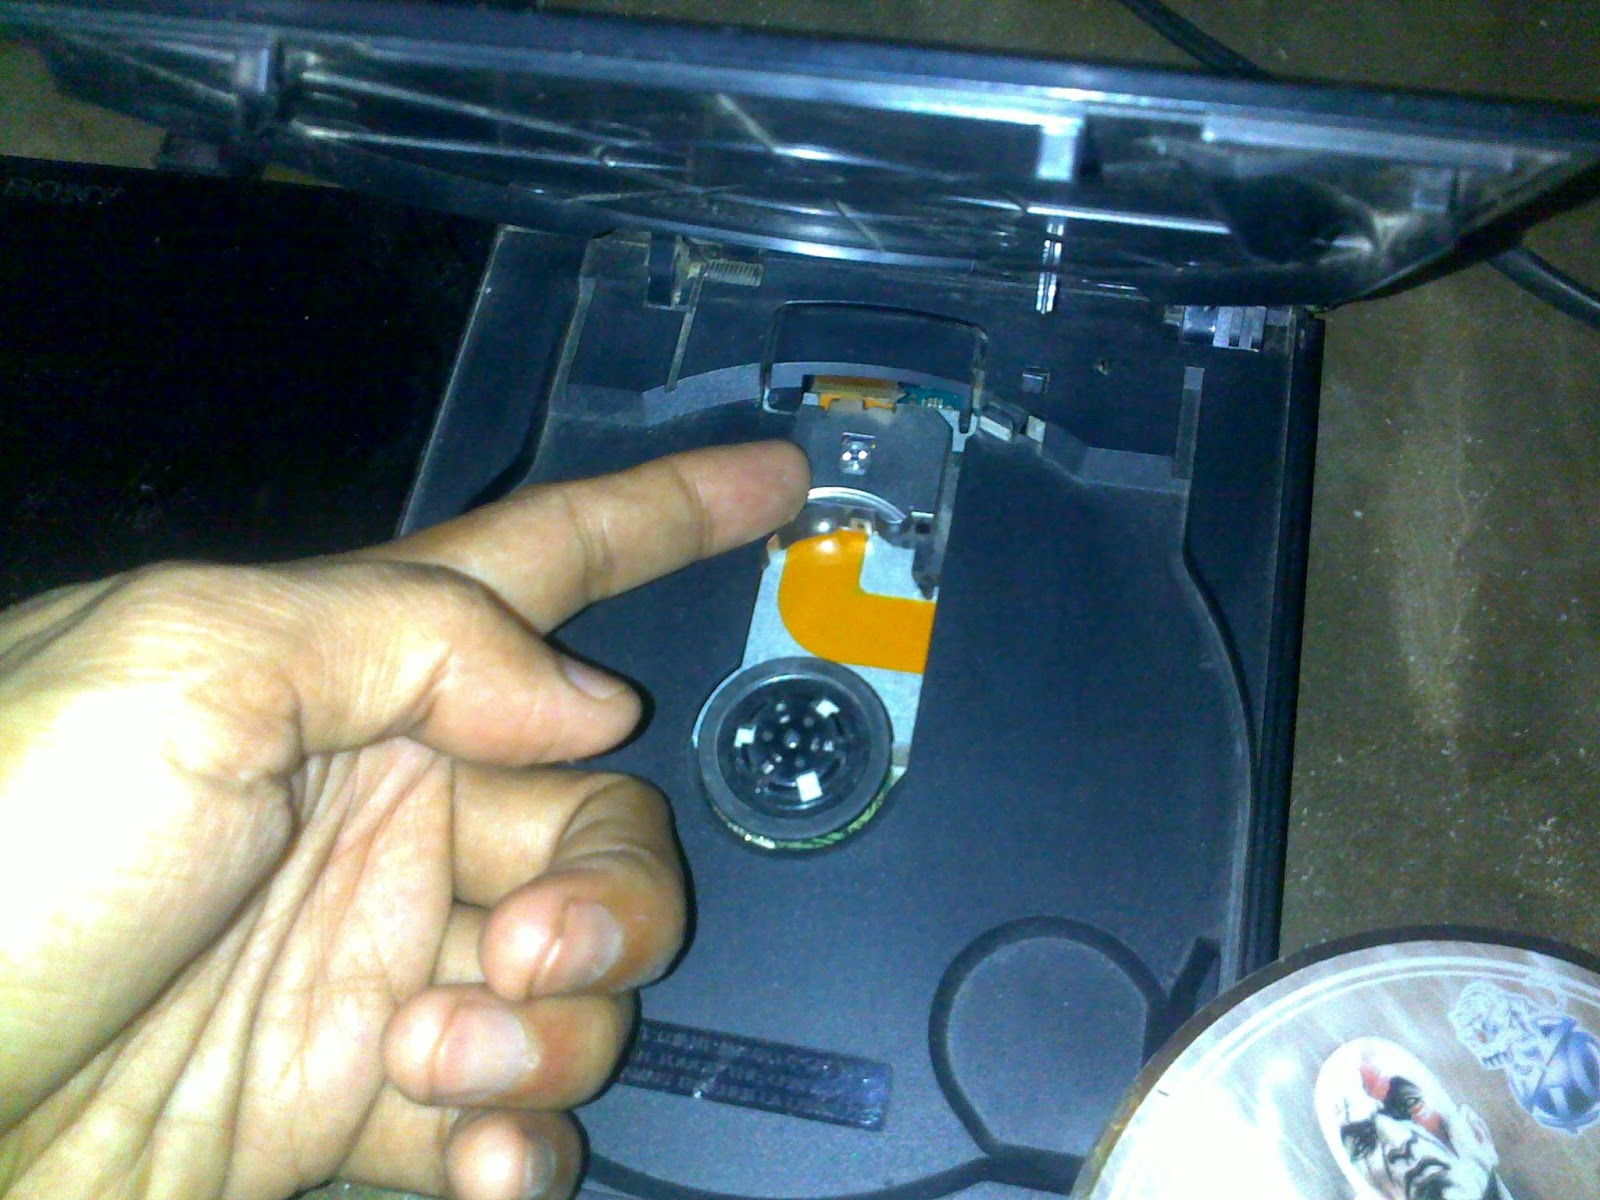 Optik PS2 Rusak Ganti Flashdisk untuk main game tanpa kaset